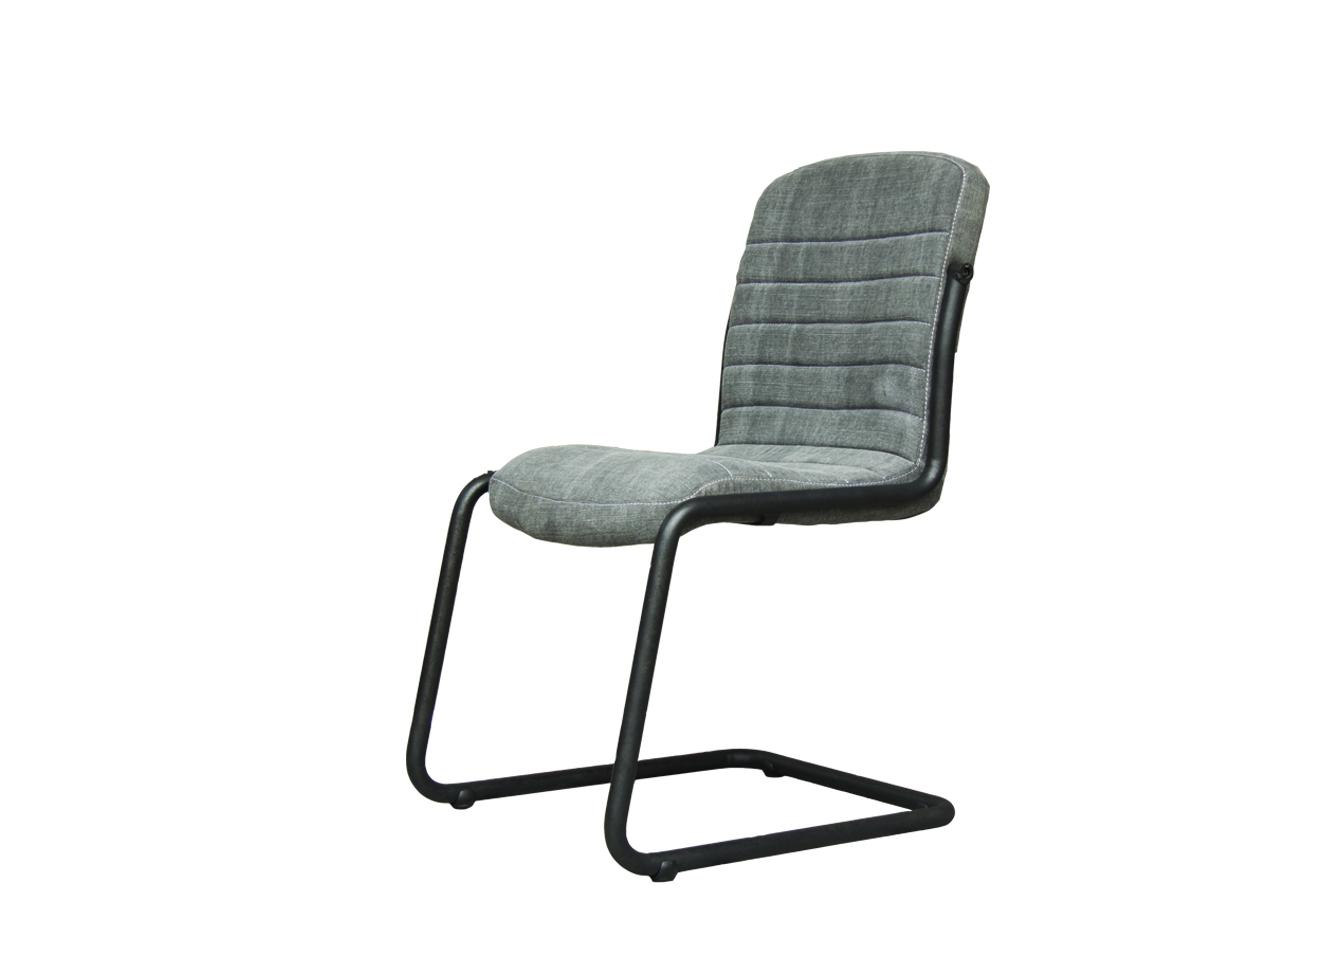 Стул ШонОбеденные стулья<br><br><br>Material: Текстиль<br>Width см: 53<br>Depth см: 63<br>Height см: 87